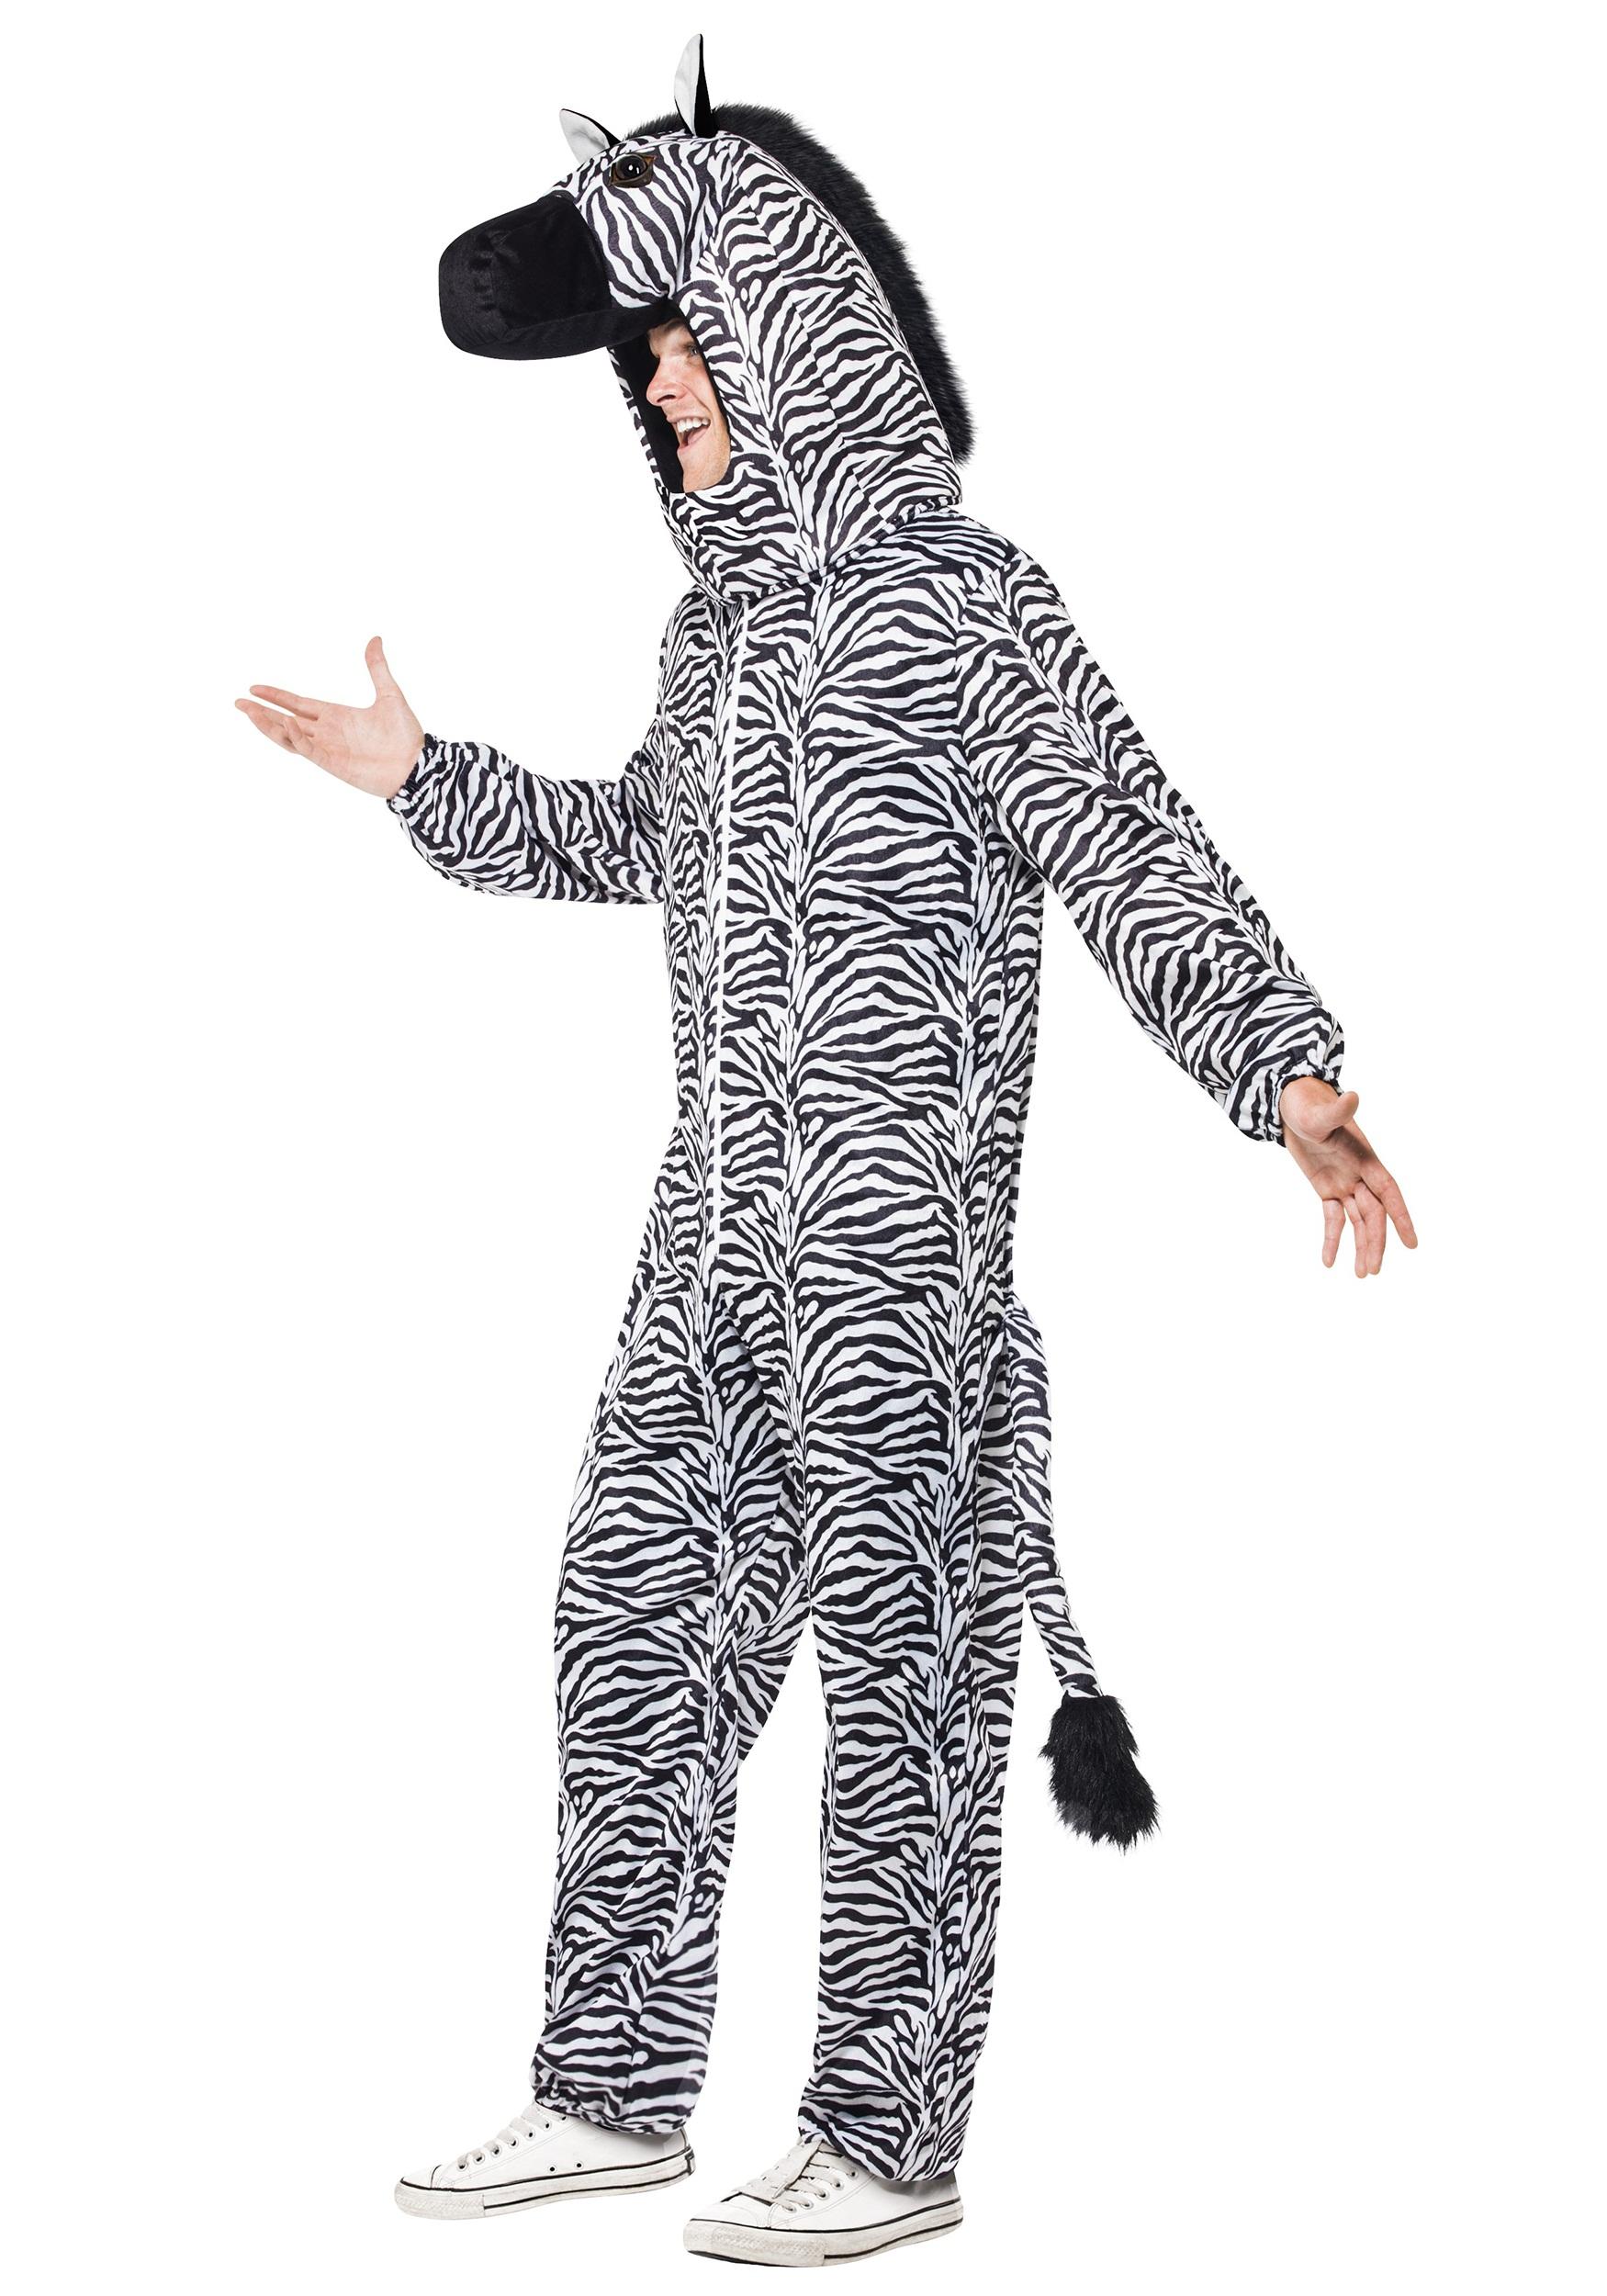 ... Zebra Costume For Adults side  sc 1 st  Halloween Costumes & Zebra Costume For Adults